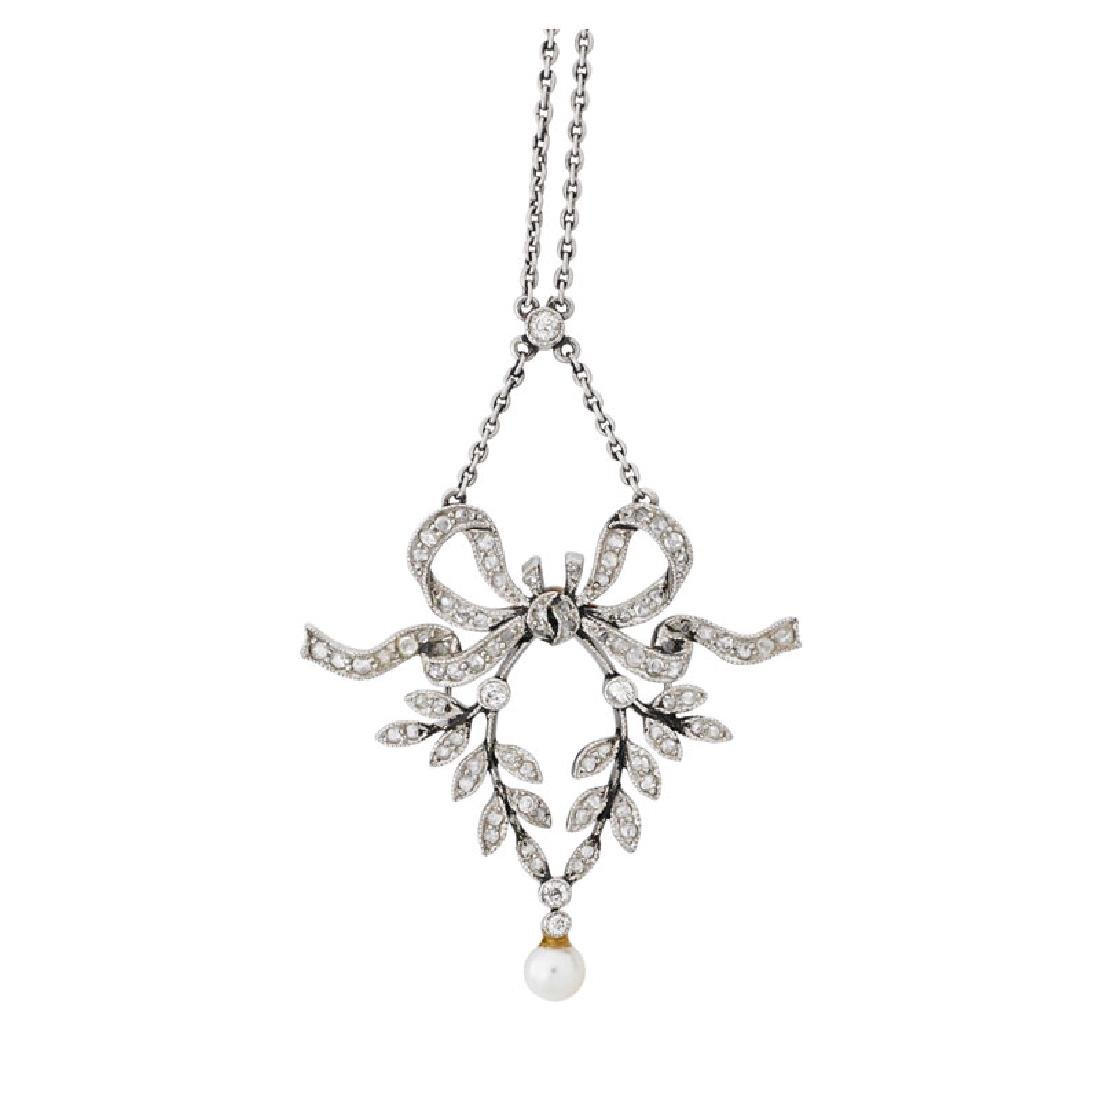 EDWARDIAN DIAMOND & SEED PEARL PENDANT NECKLACE